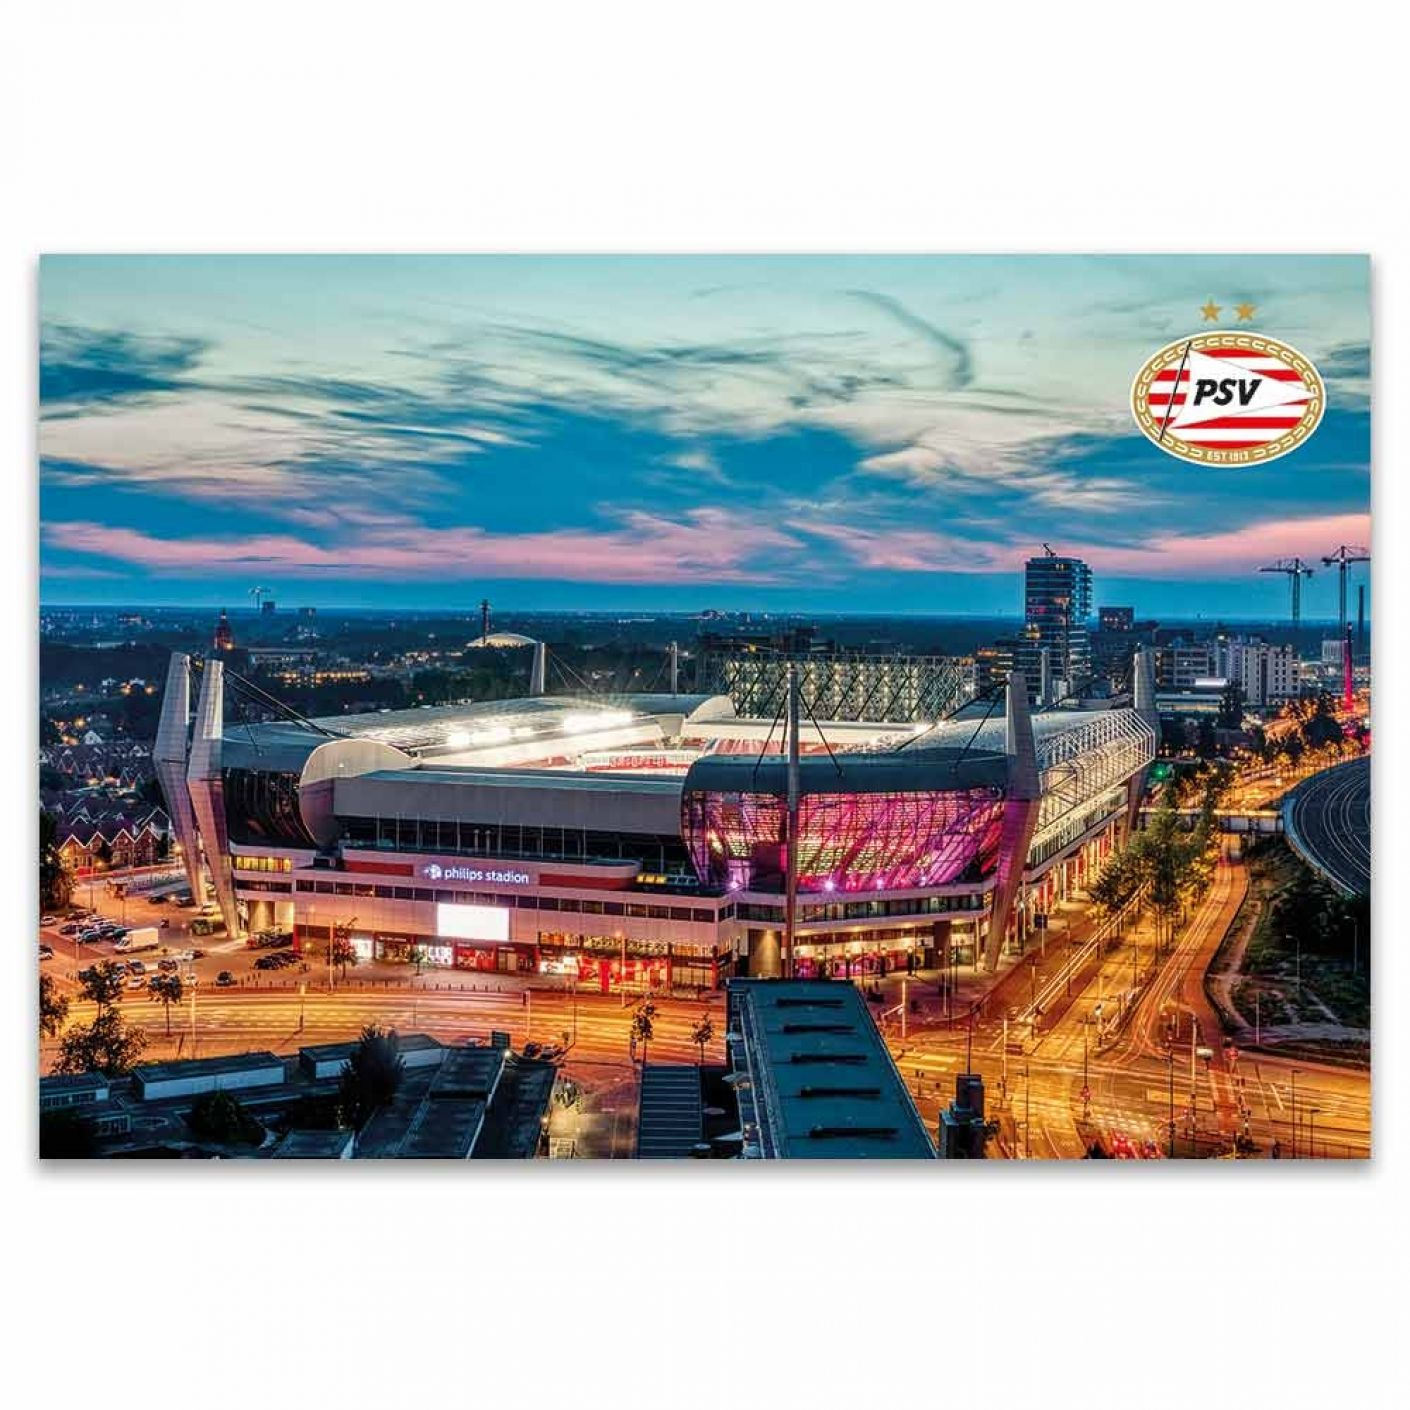 PSV Poster Stadion Avond